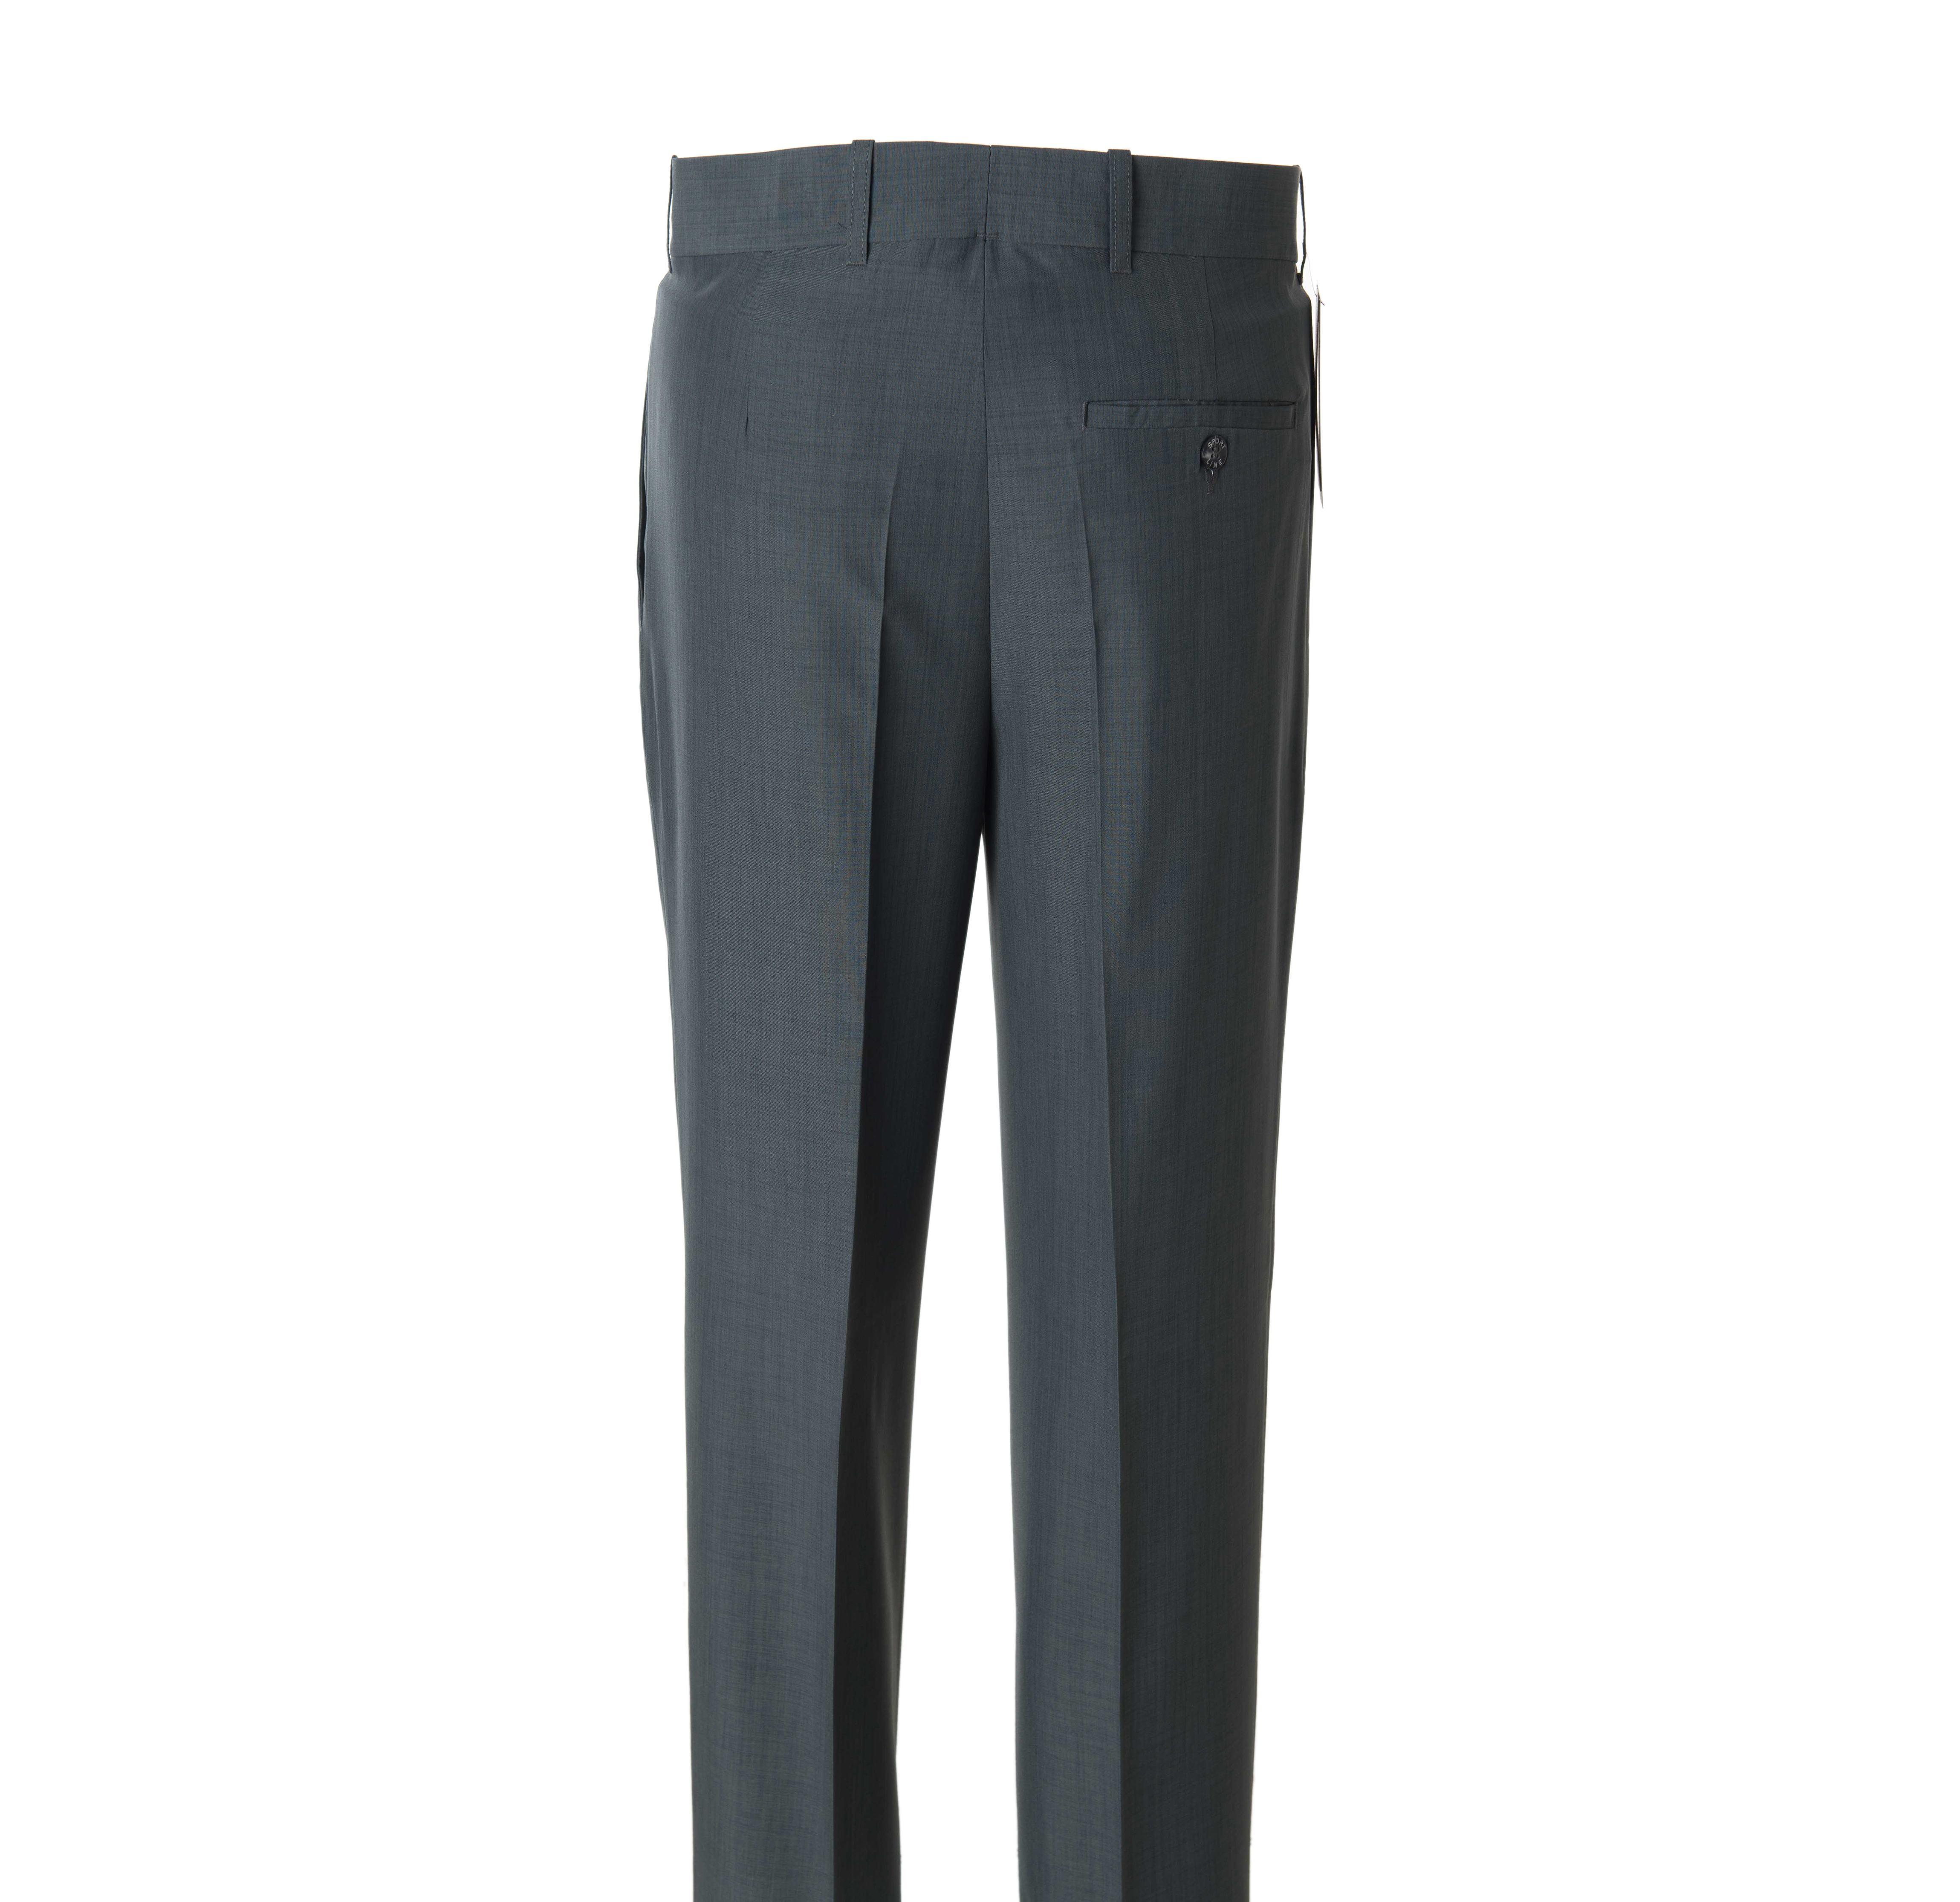 Pantalon De Caballero Para Verano Rufi Fresco Y Elegante Pantalones Blaper